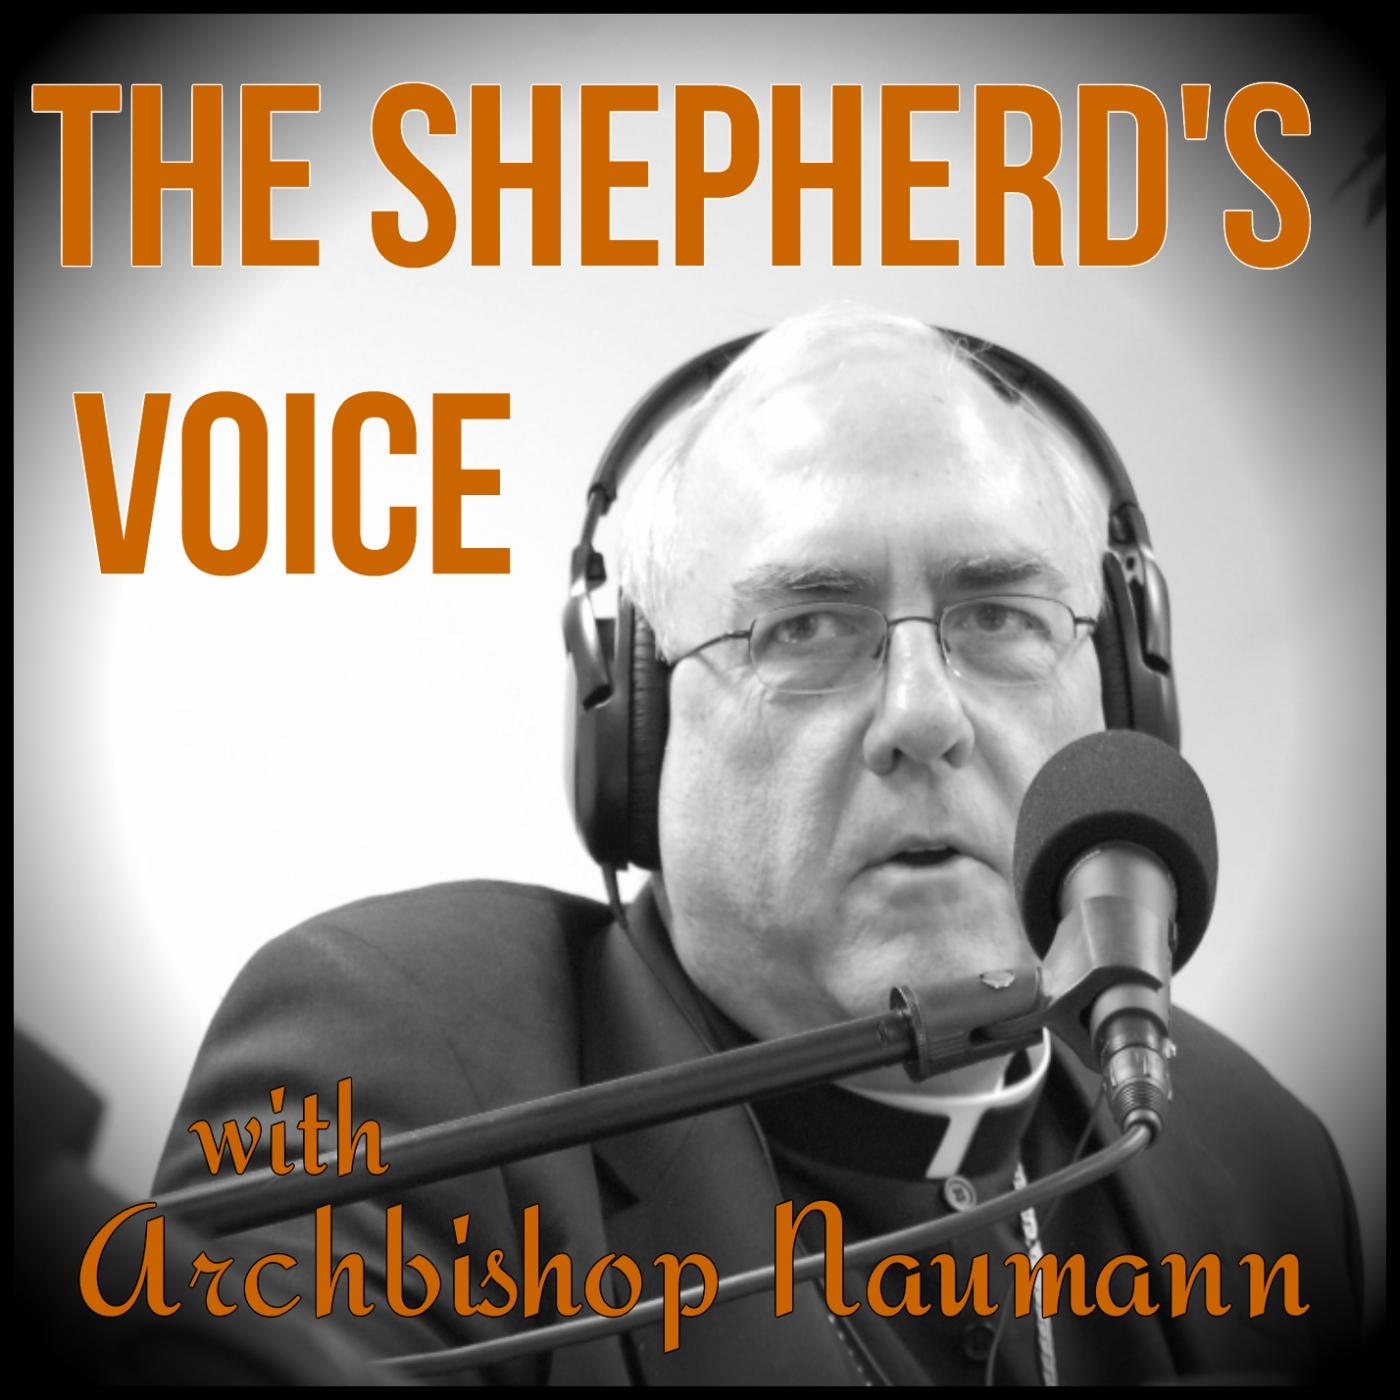 The Shepherd's Voice show art